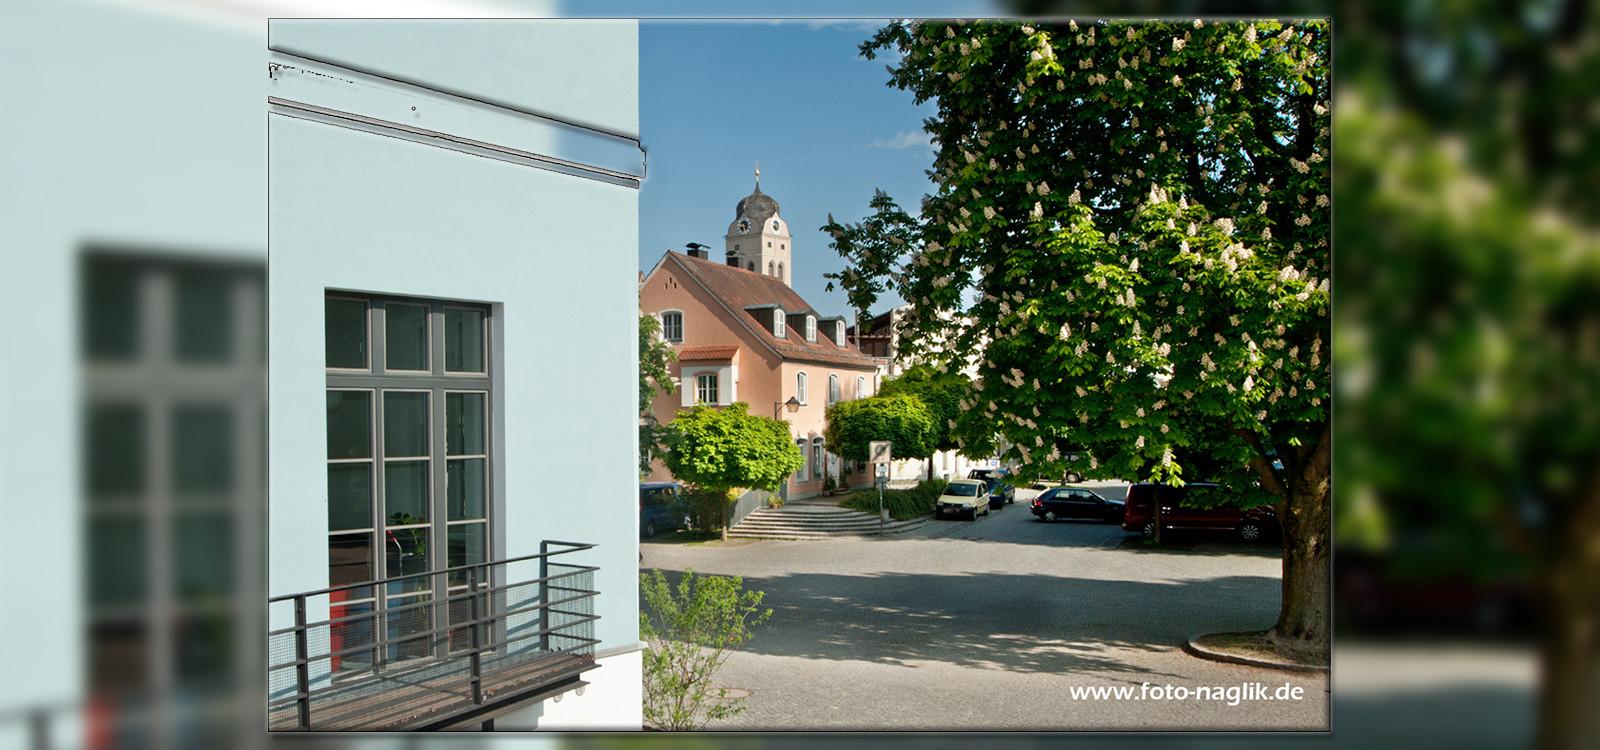 Naglik-Foto-Erding-Architektur-10 Kopie